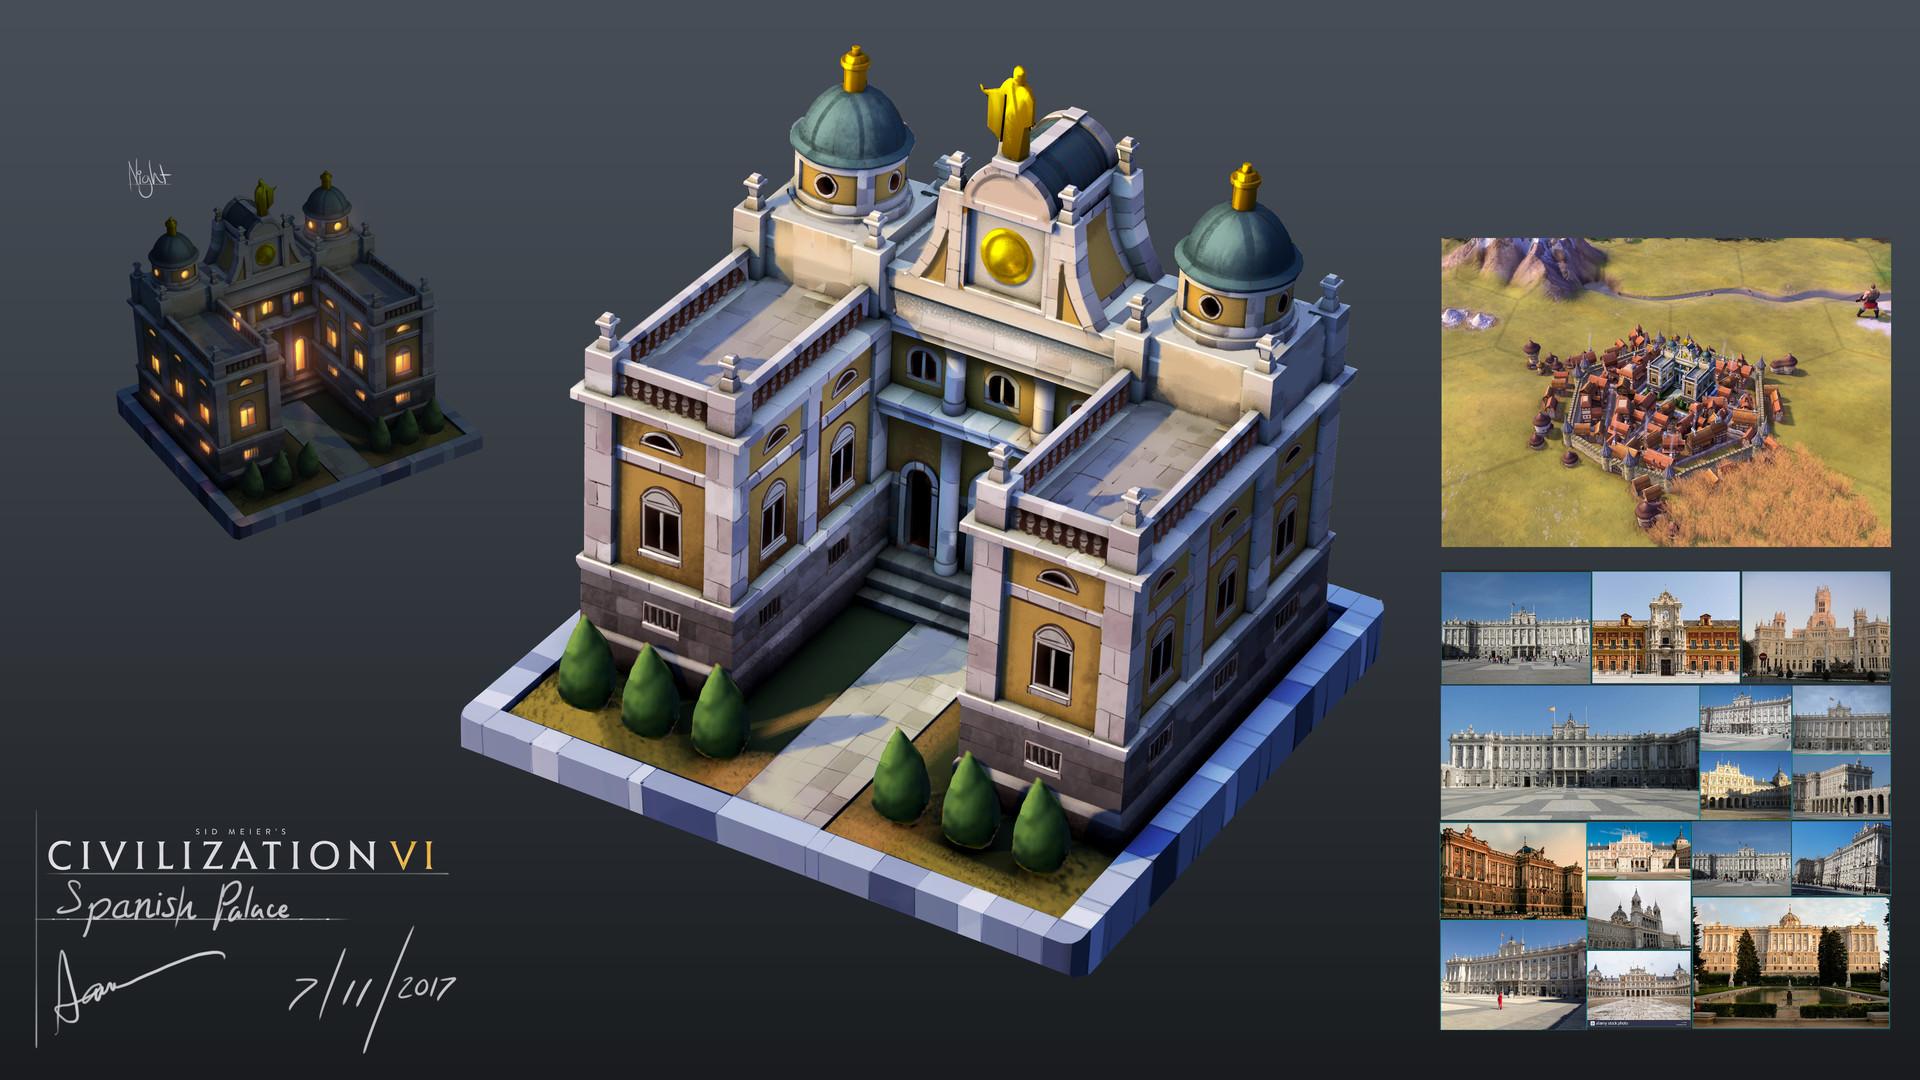 Samuel aaron whitehex spanish palace concept